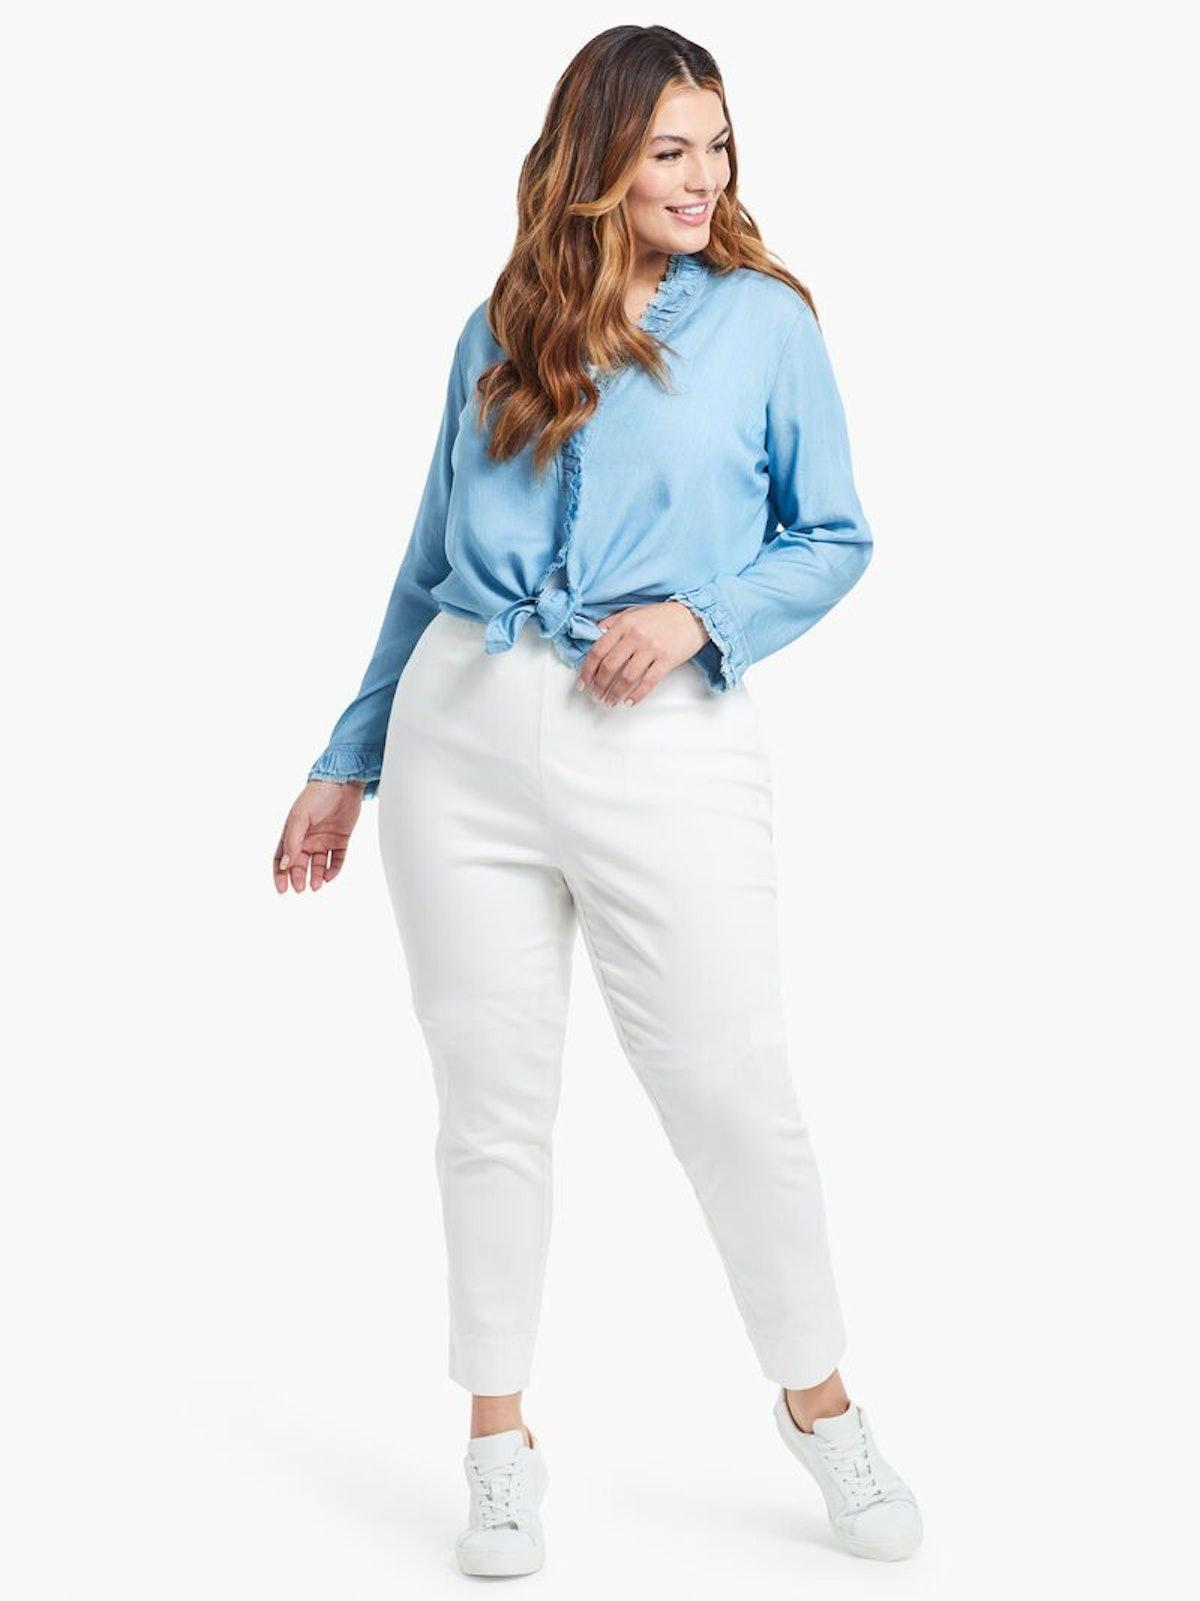 All Day Garment Dye Denim Pant in Paper White